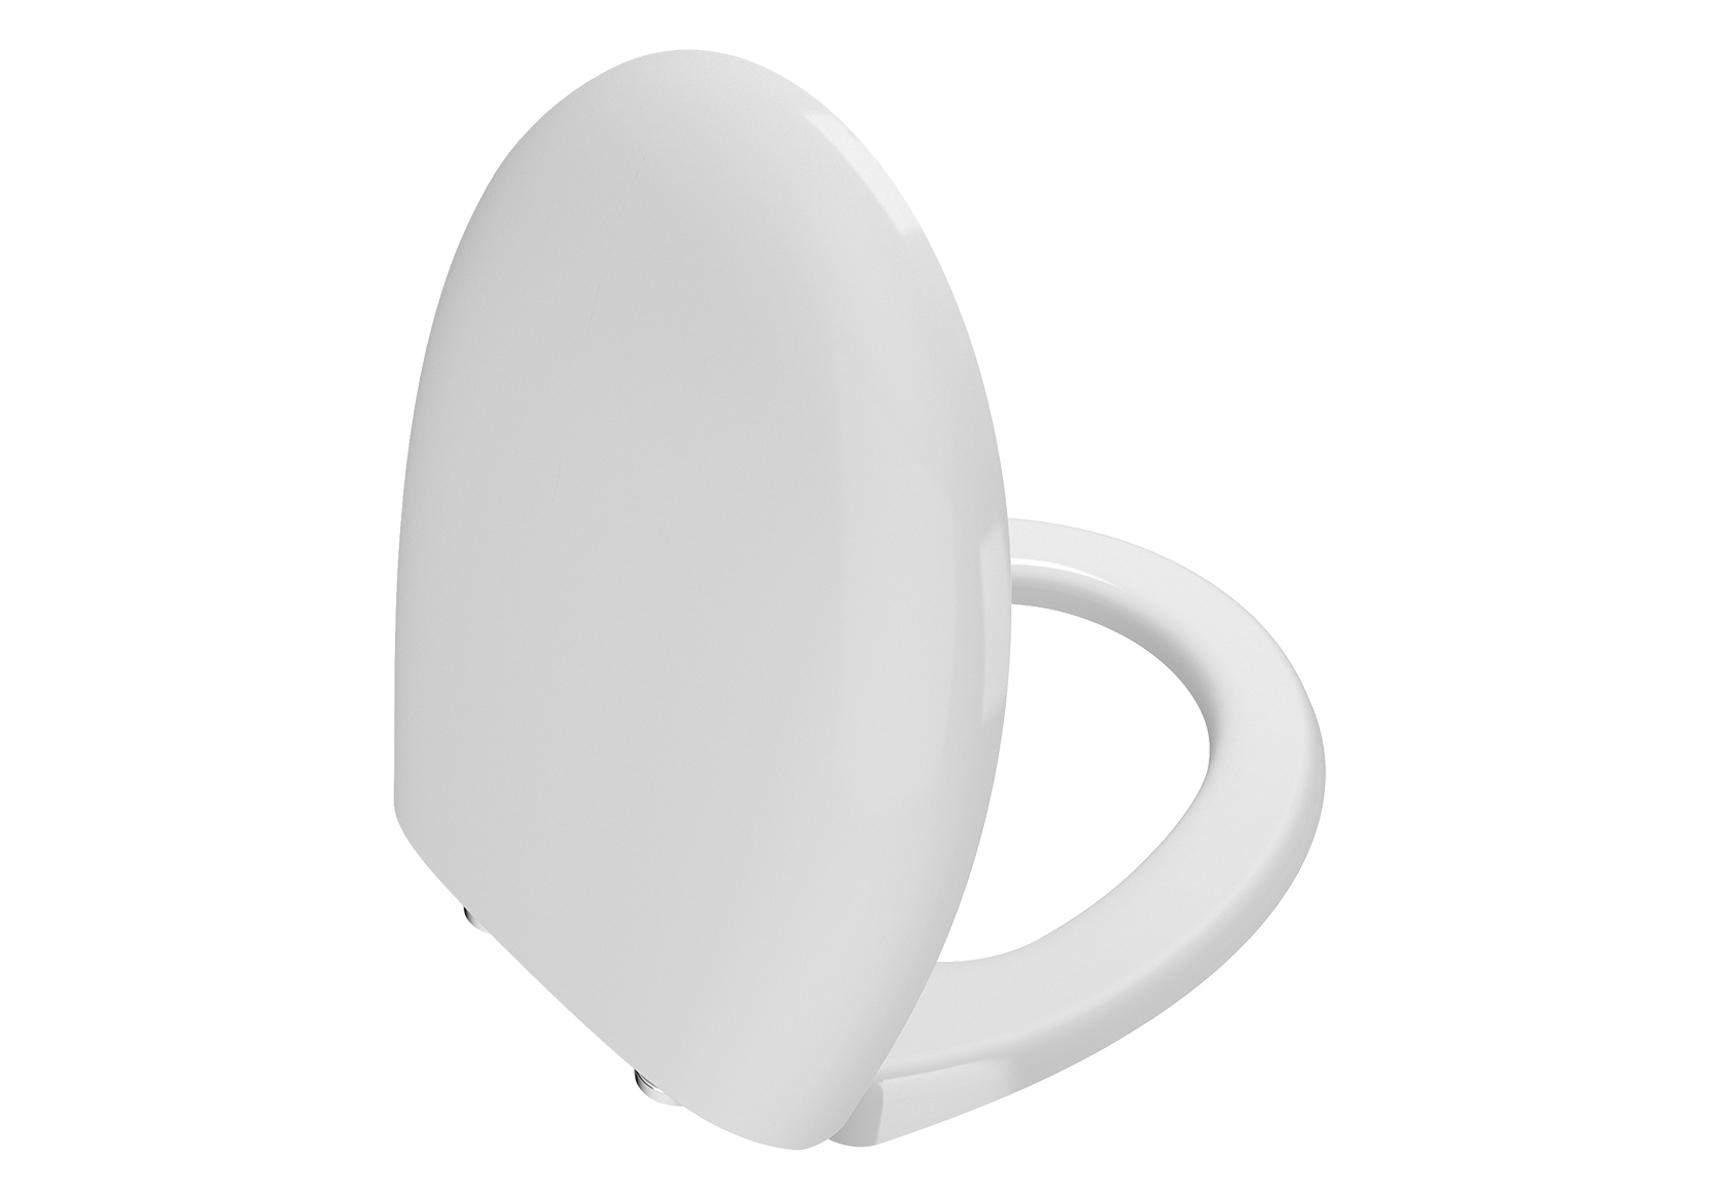 Memoria WC-Sitz mit Absenkautomatik, Taupe Matt